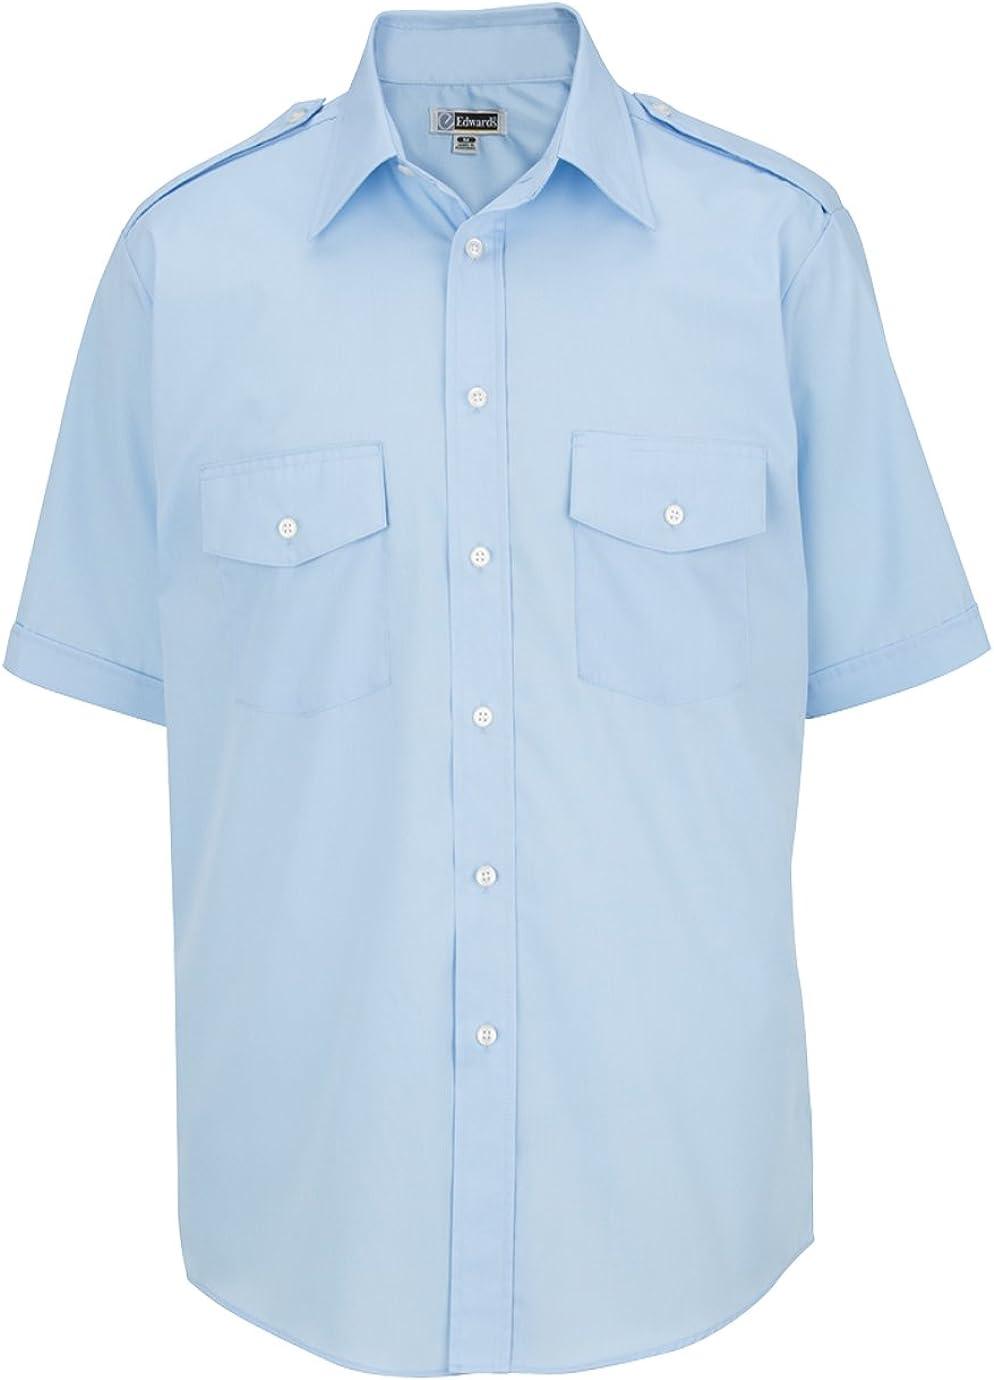 Edwards Garment Men's Performance Security Shirt